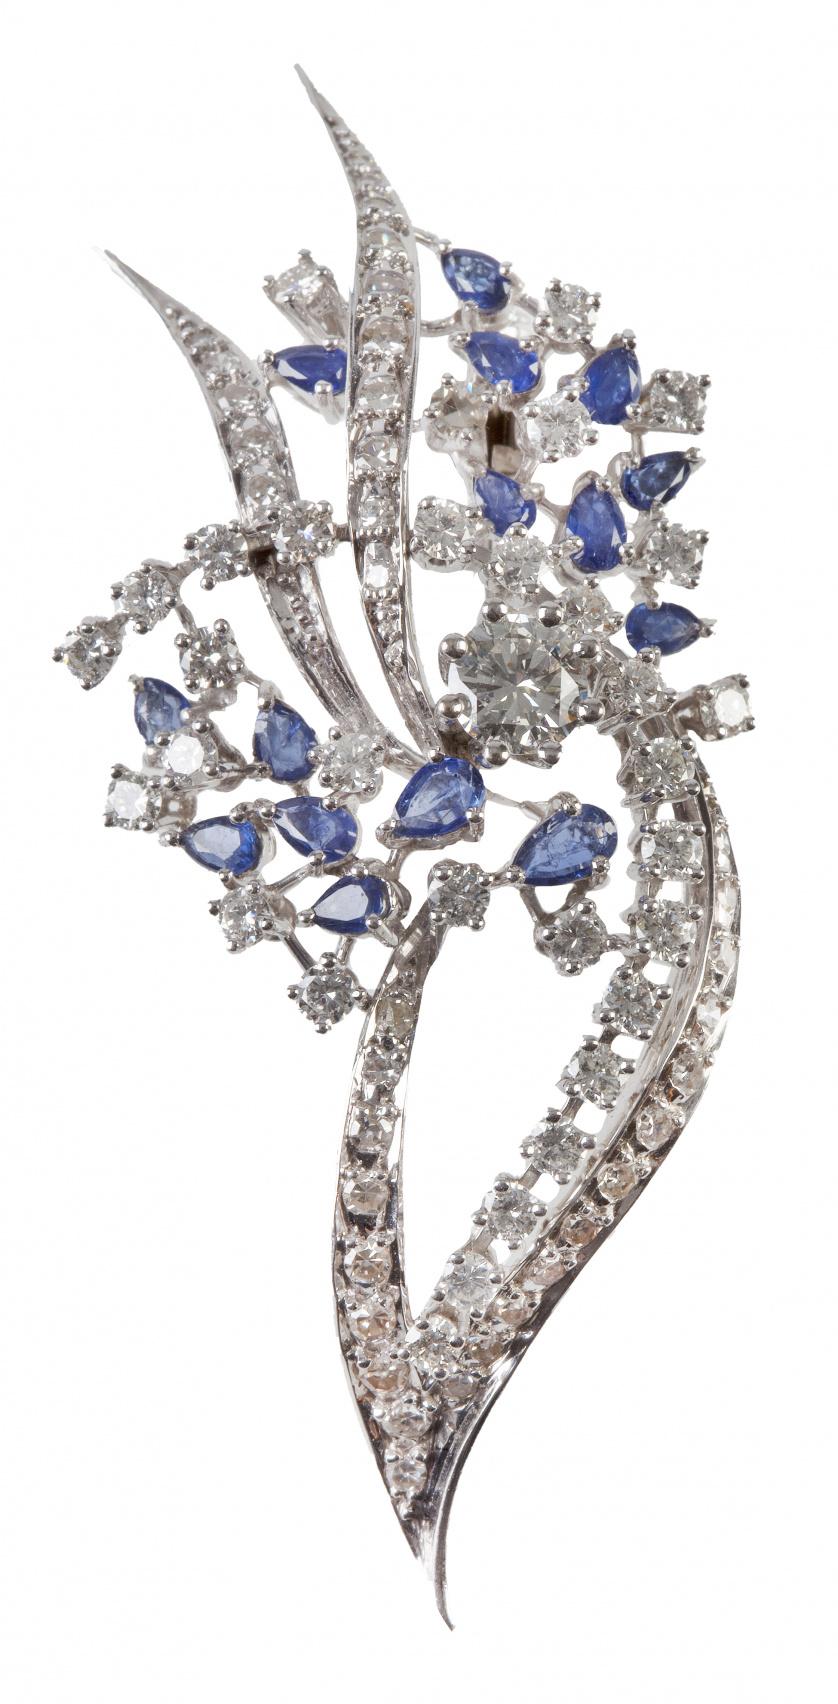 Broche con ramas de brillantes combinadas con racimos de za